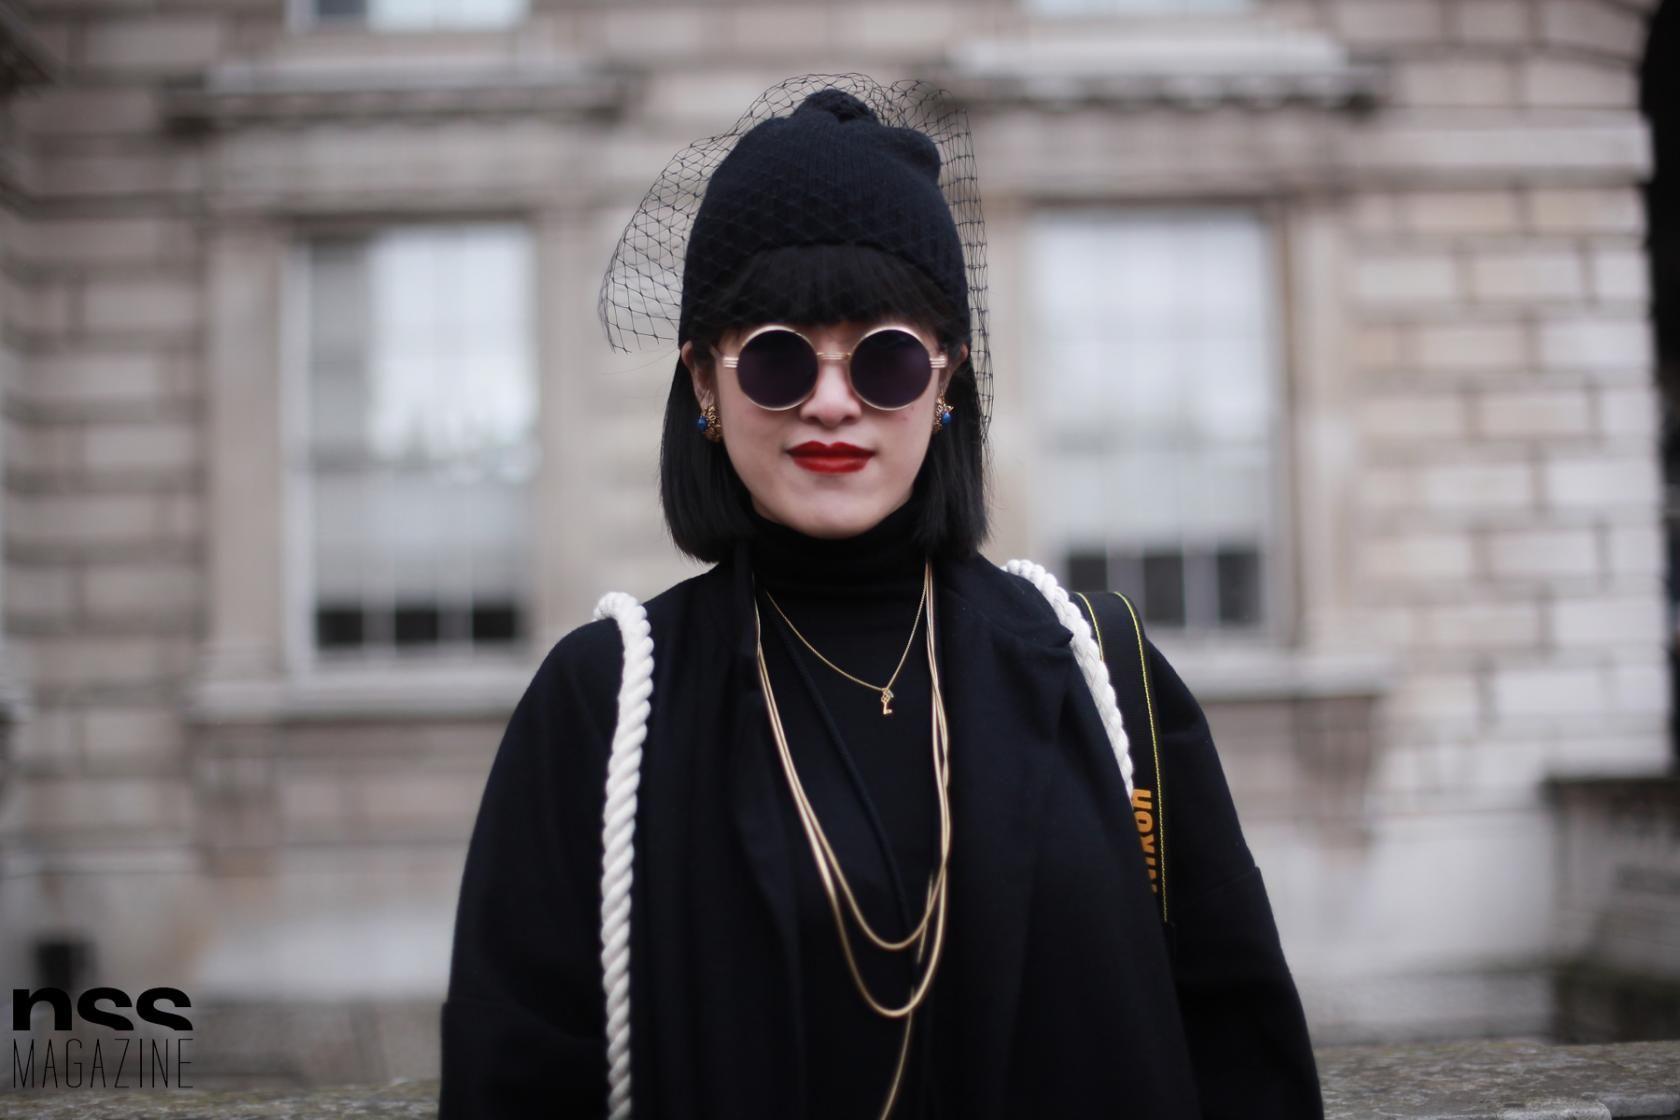 London Woman Fashion Week FW14 - First Part